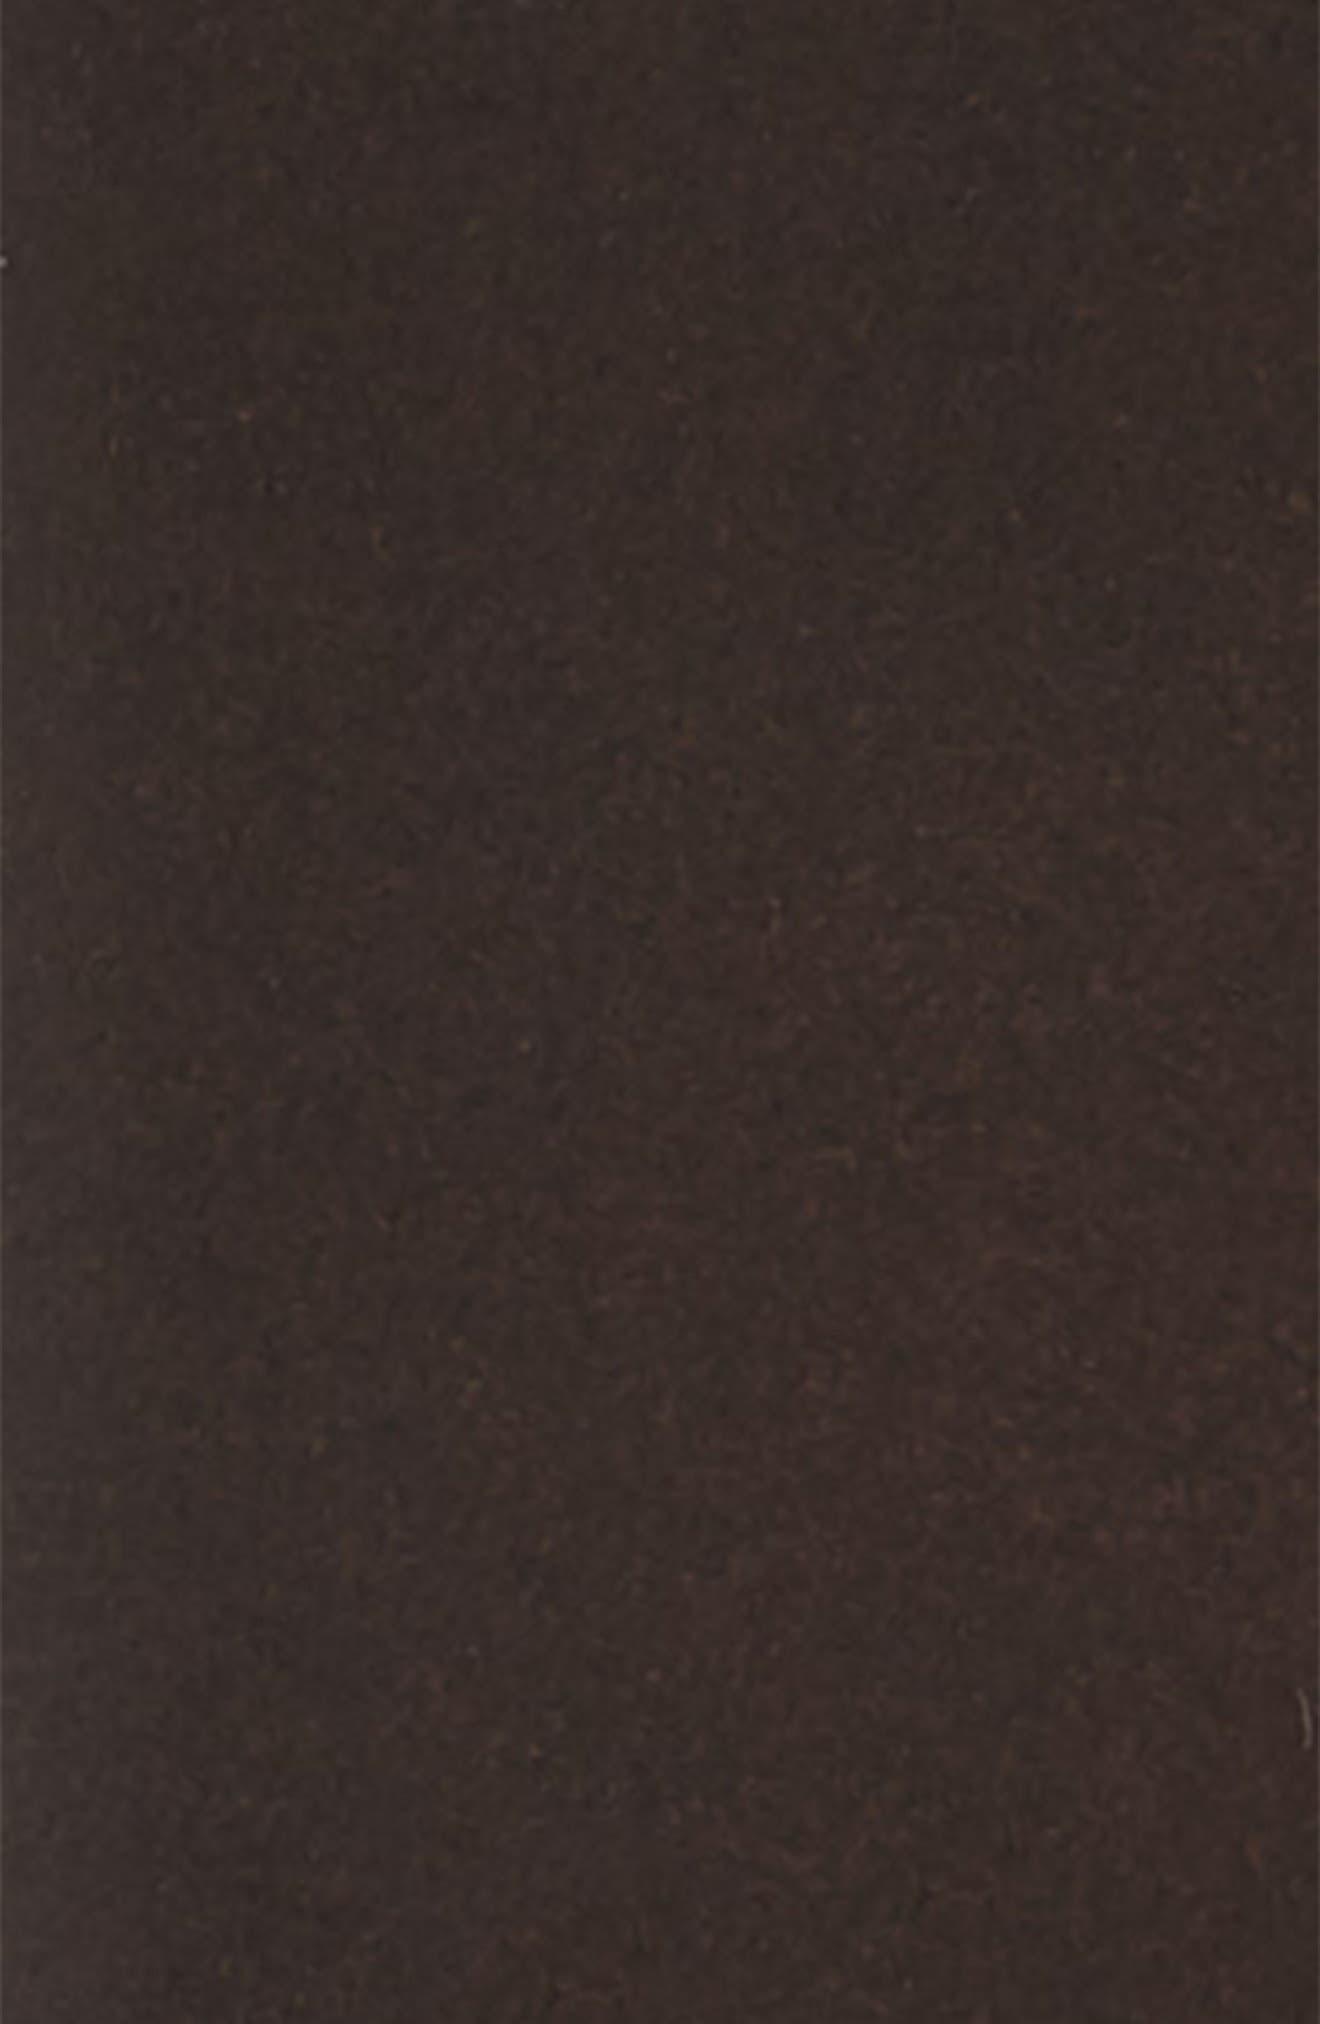 SALVATORE FERRAGAMO, Reversible Leather Belt, Alternate thumbnail 3, color, AFRICA/ NERO